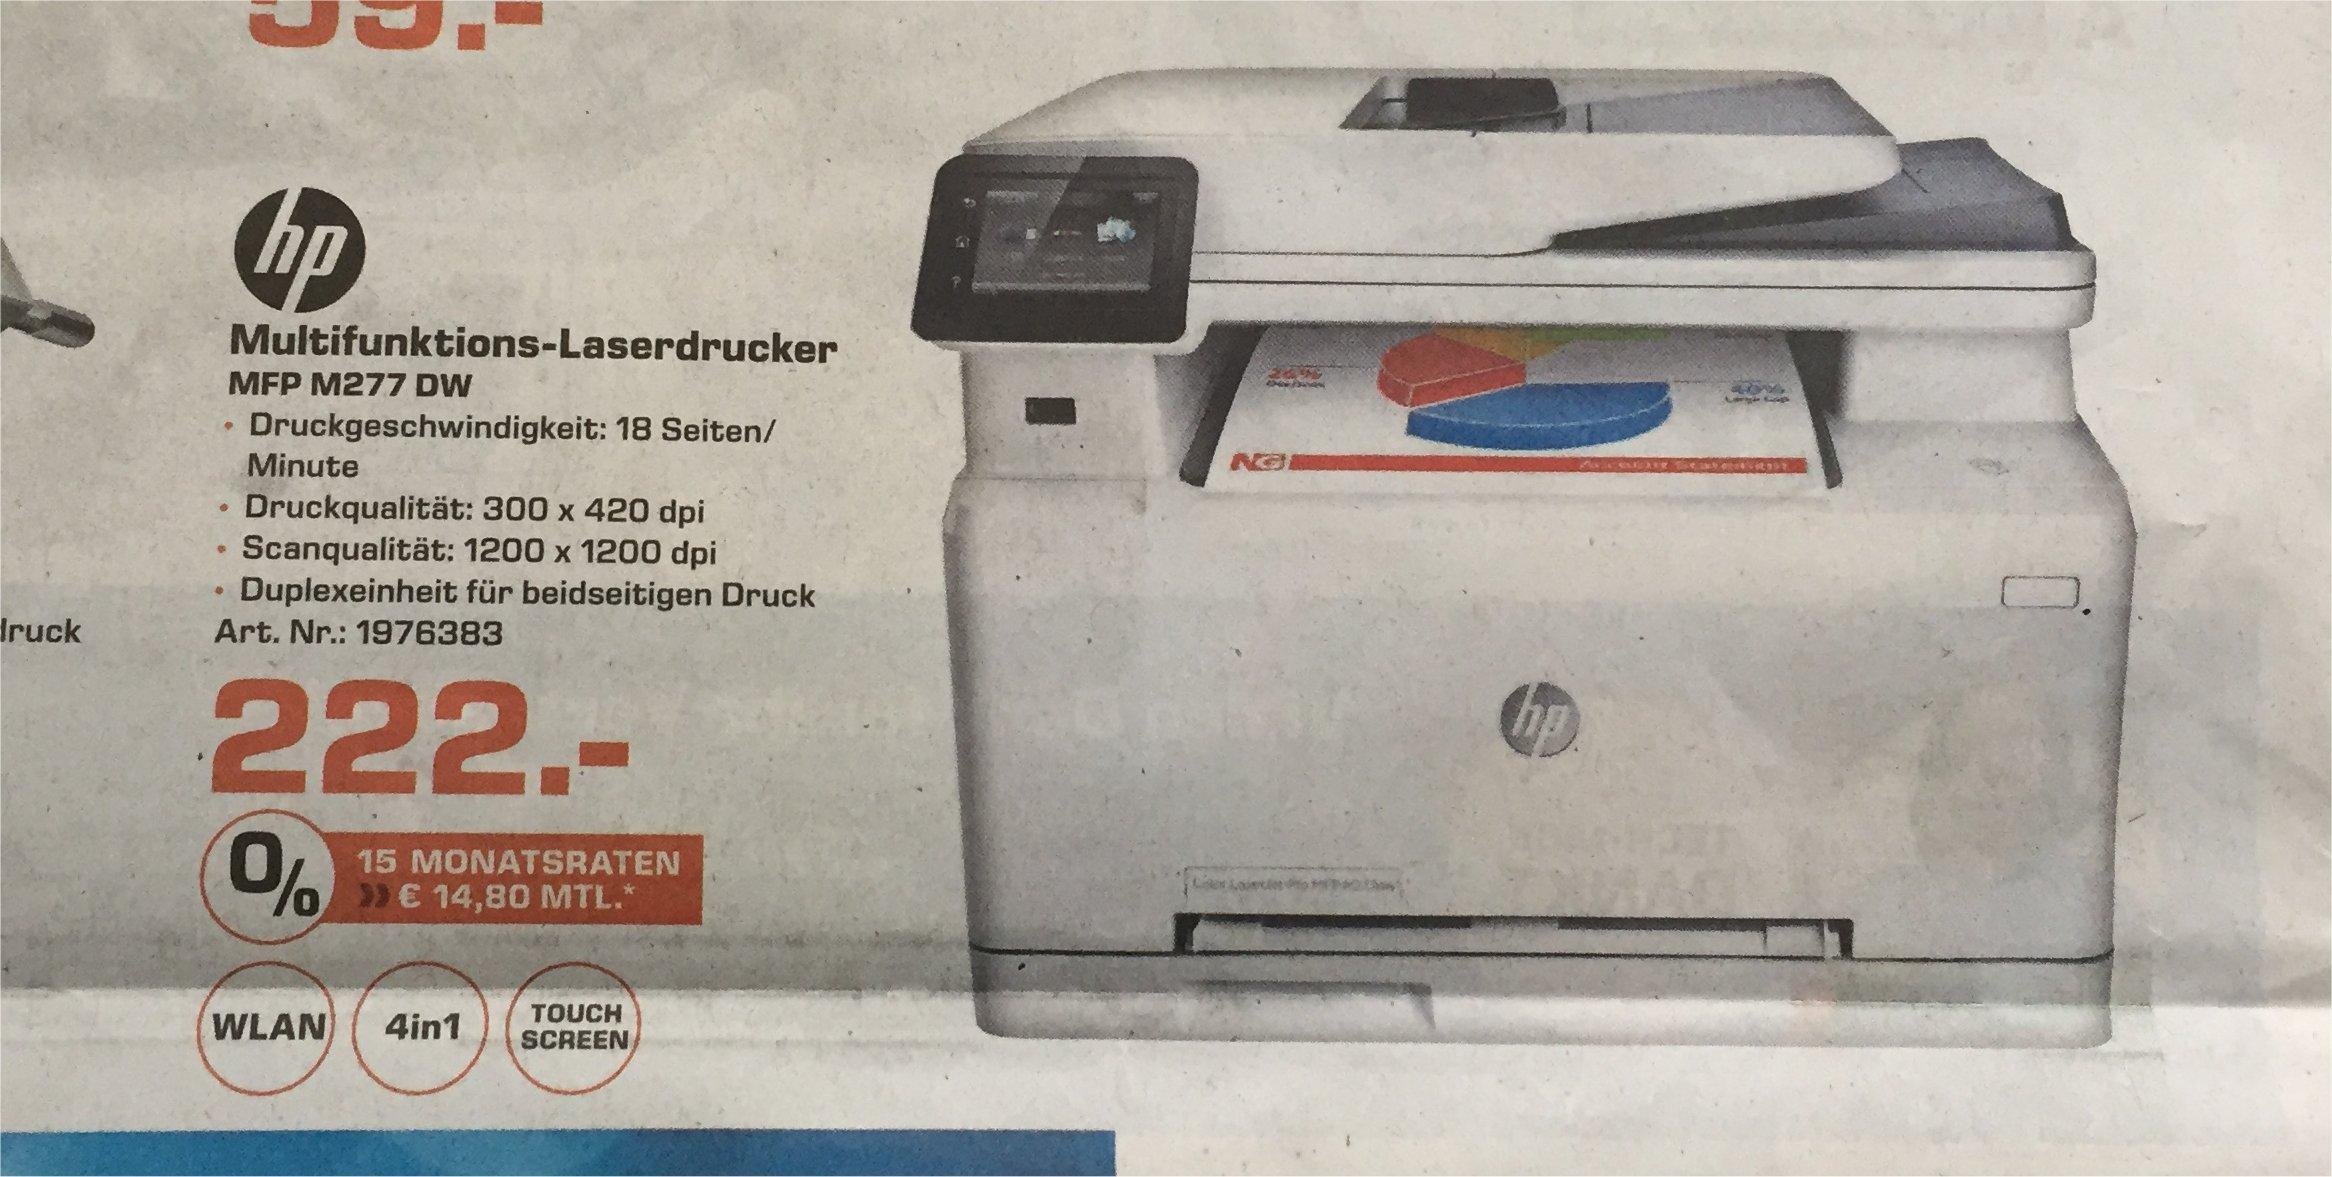 Multifunktions-Laserdrucker  Hewlett Packard MFP 277 DW, Saturn (lokal Köln/Bonn/Rhein-Sieg?)